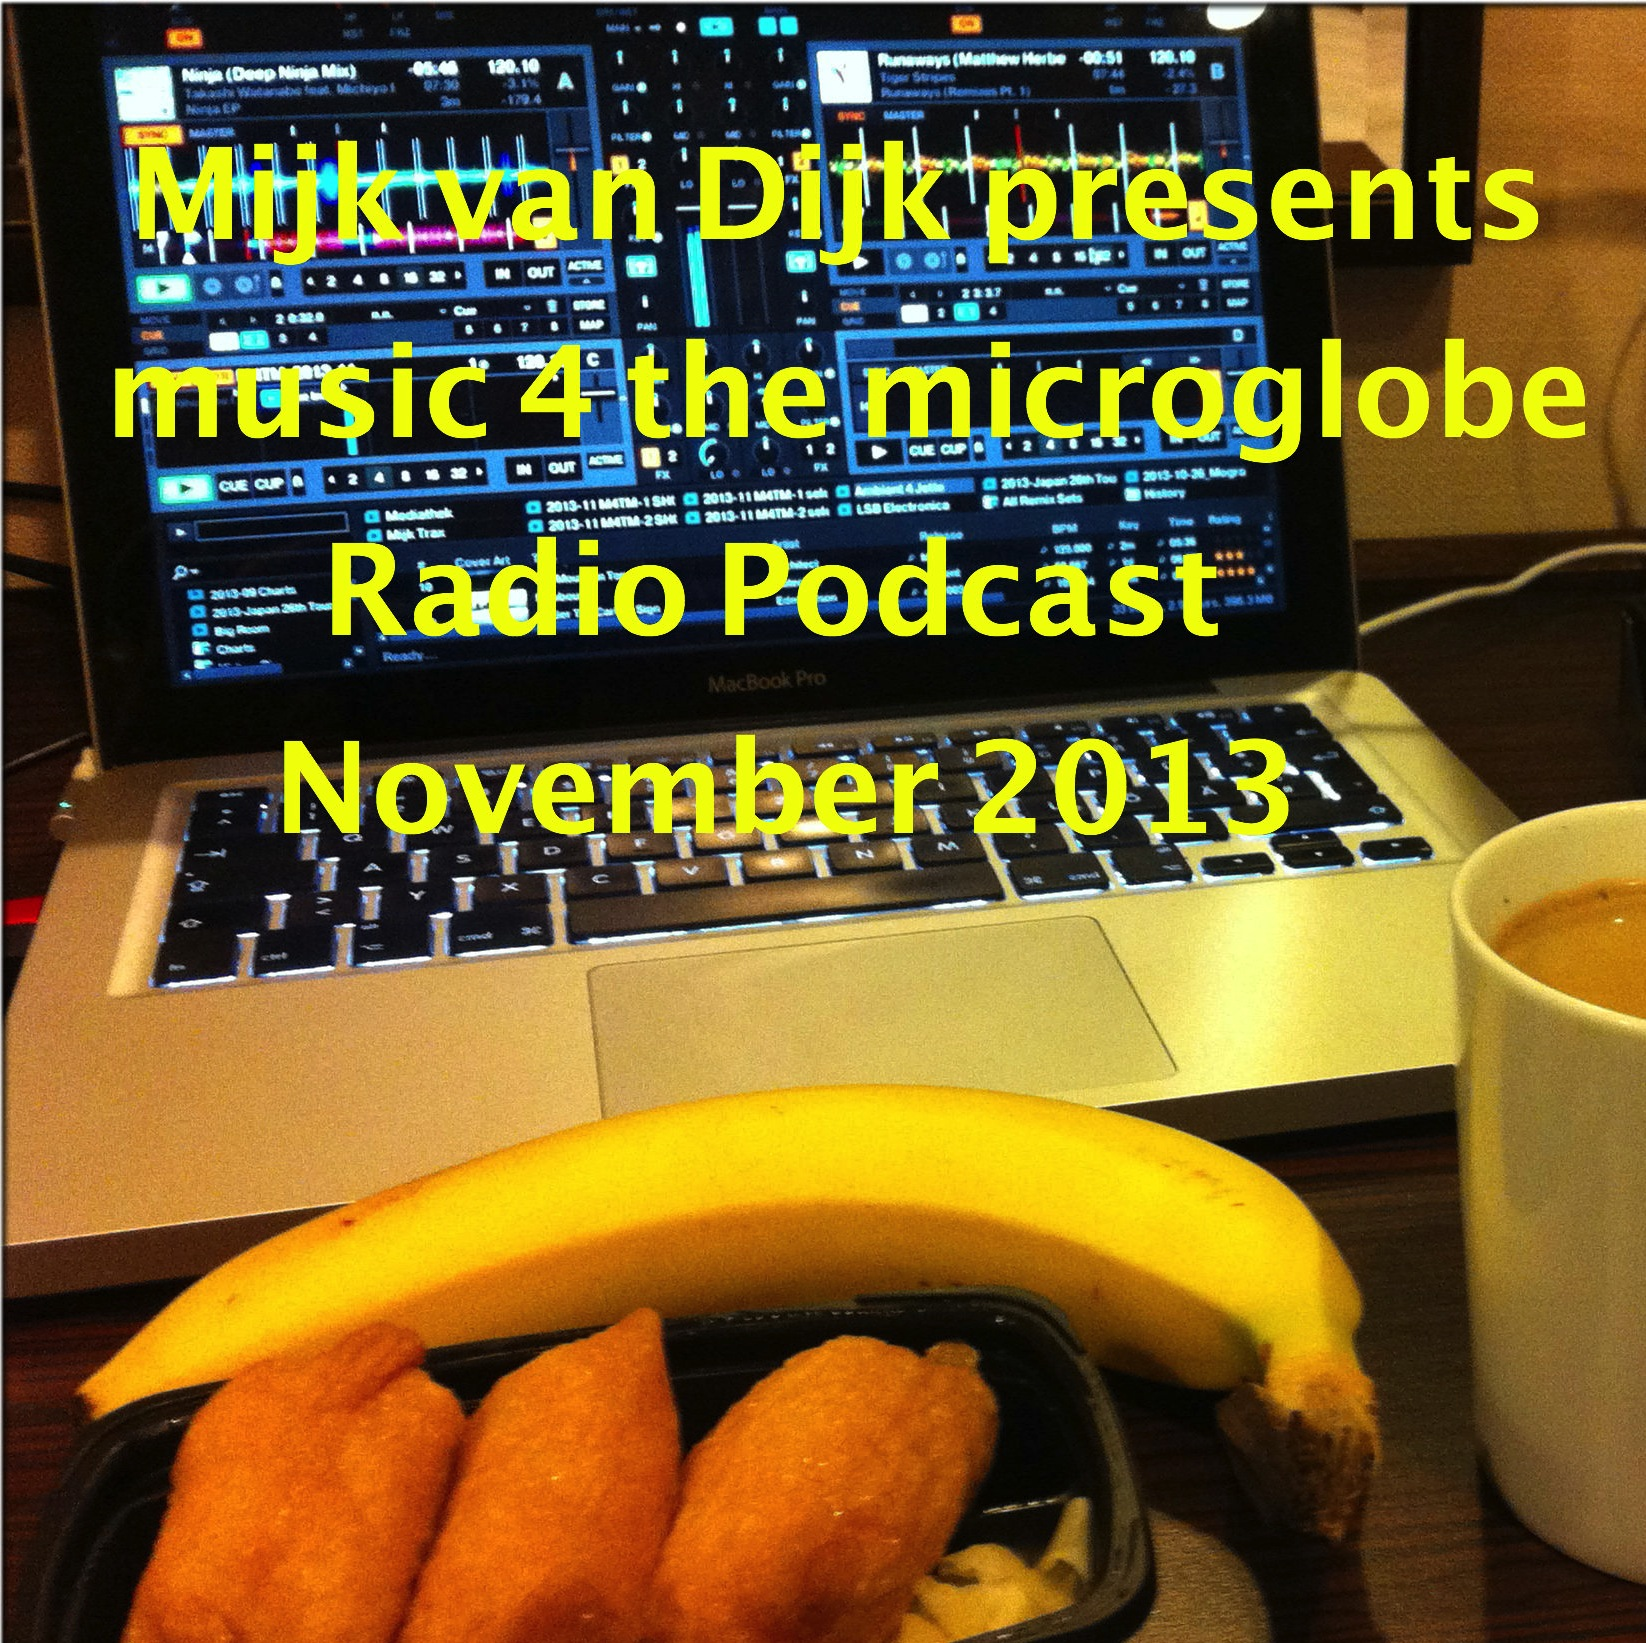 music 4 the microglobe #8, November 2013